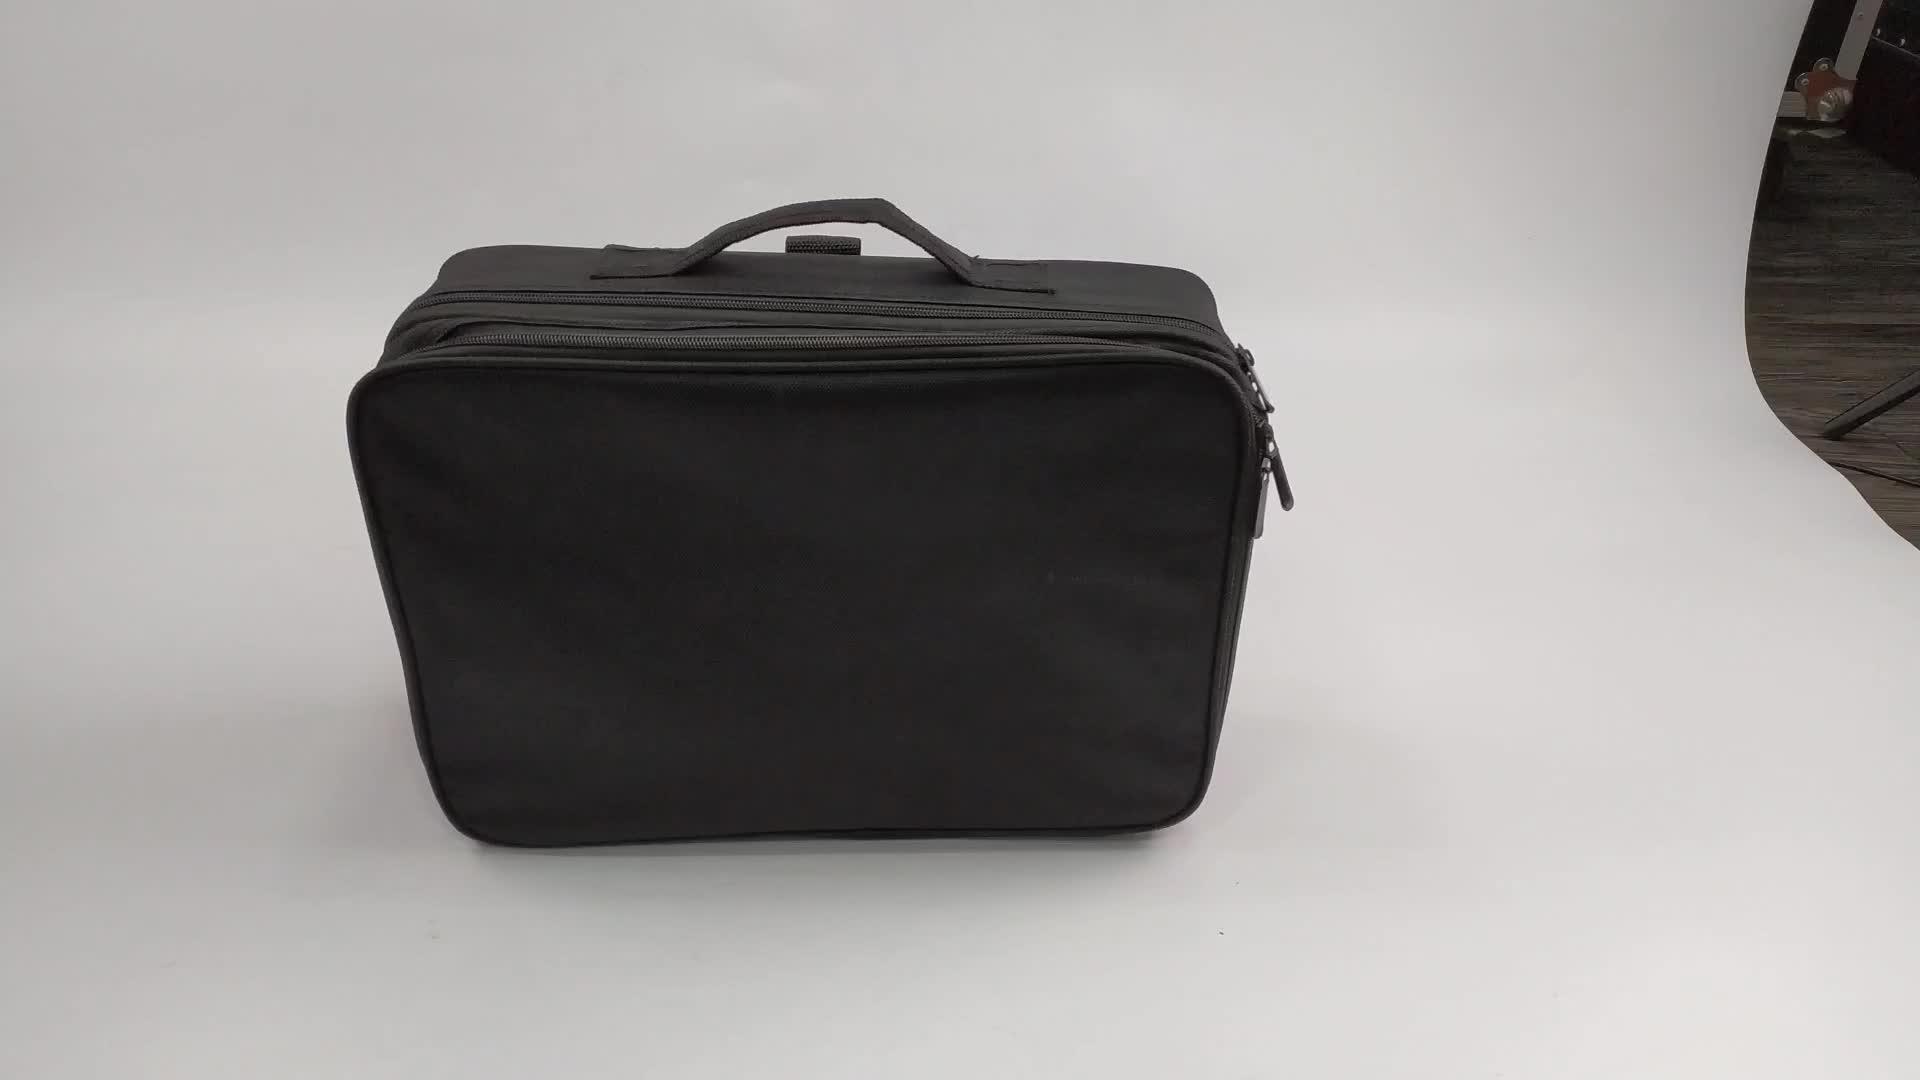 Portable Cosmetic Bag Makeup Case Make Up Travel Bag